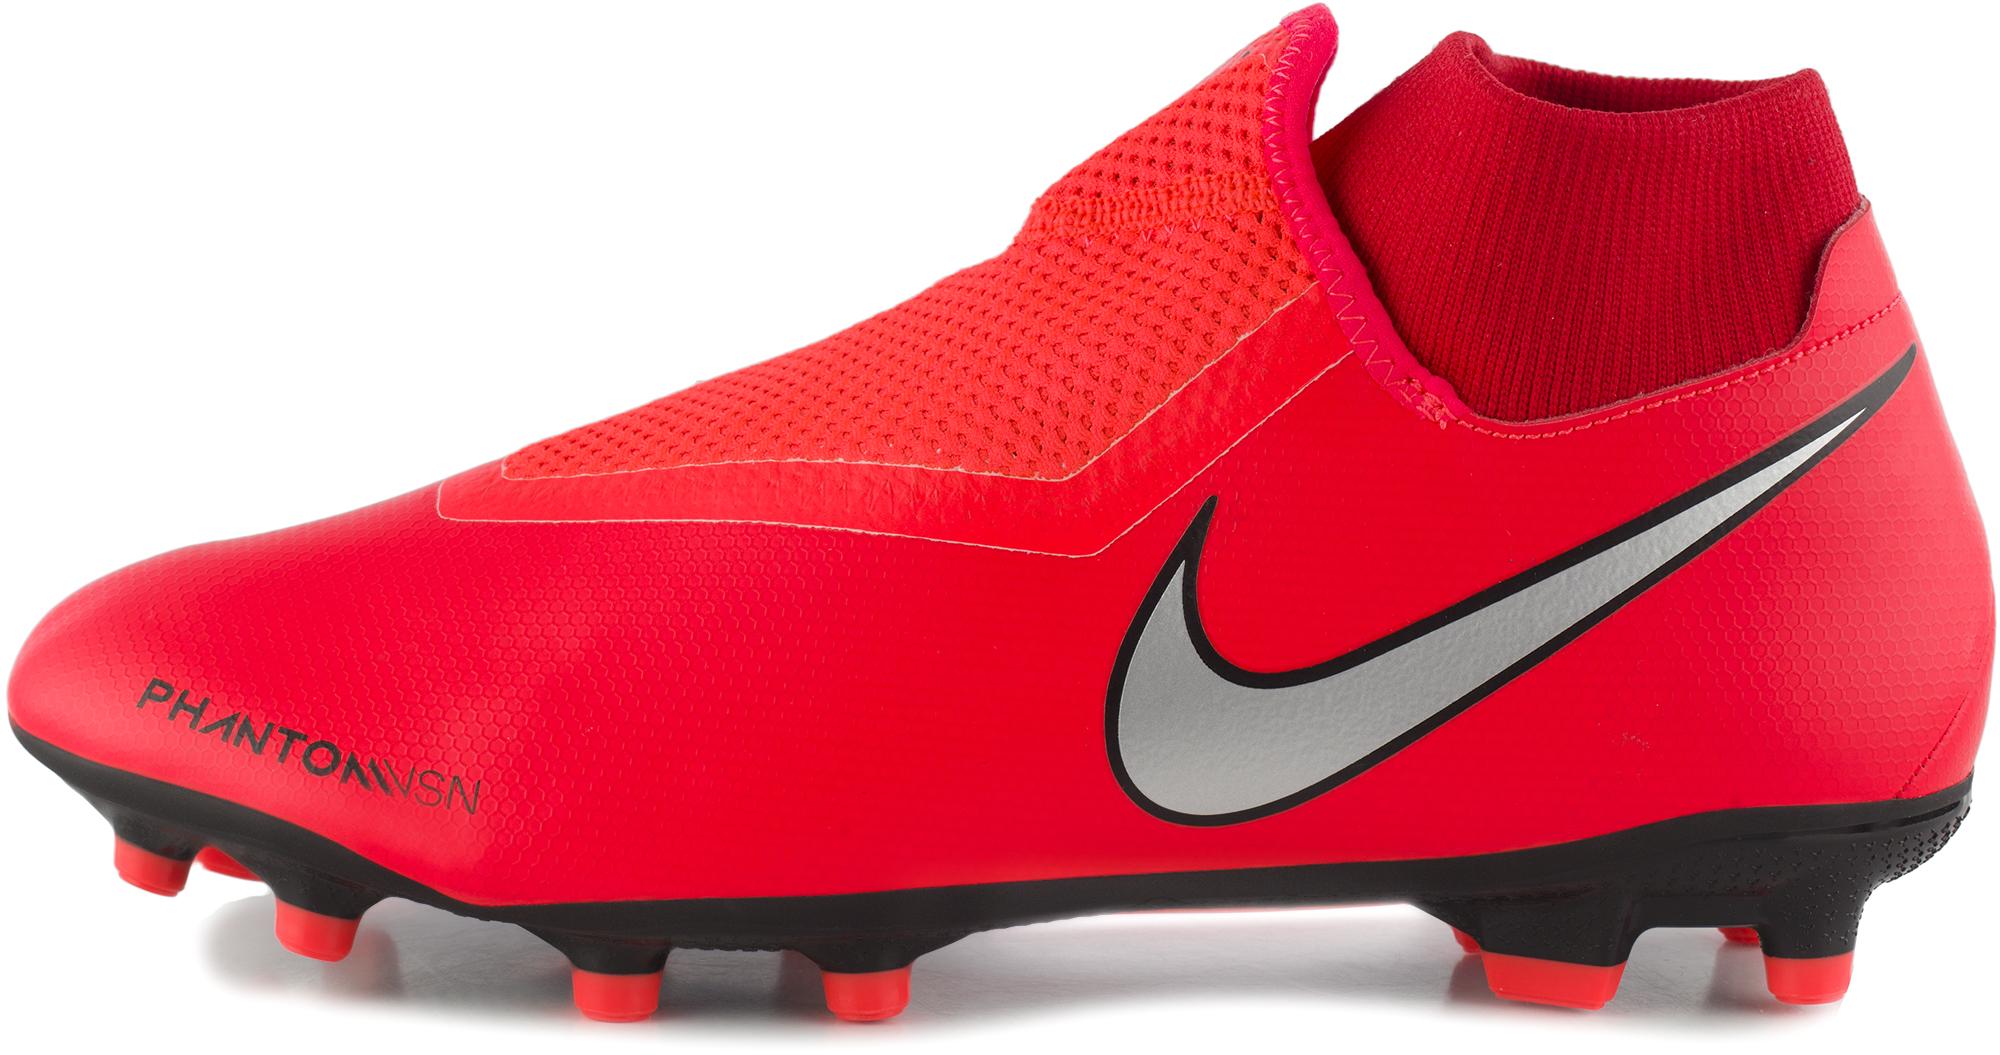 Nike Бутсы мужские Nike Phantom Vsn Academy DF FG/MG, размер 43,5 бутсы 2k sport hurricane fg lime black 125326